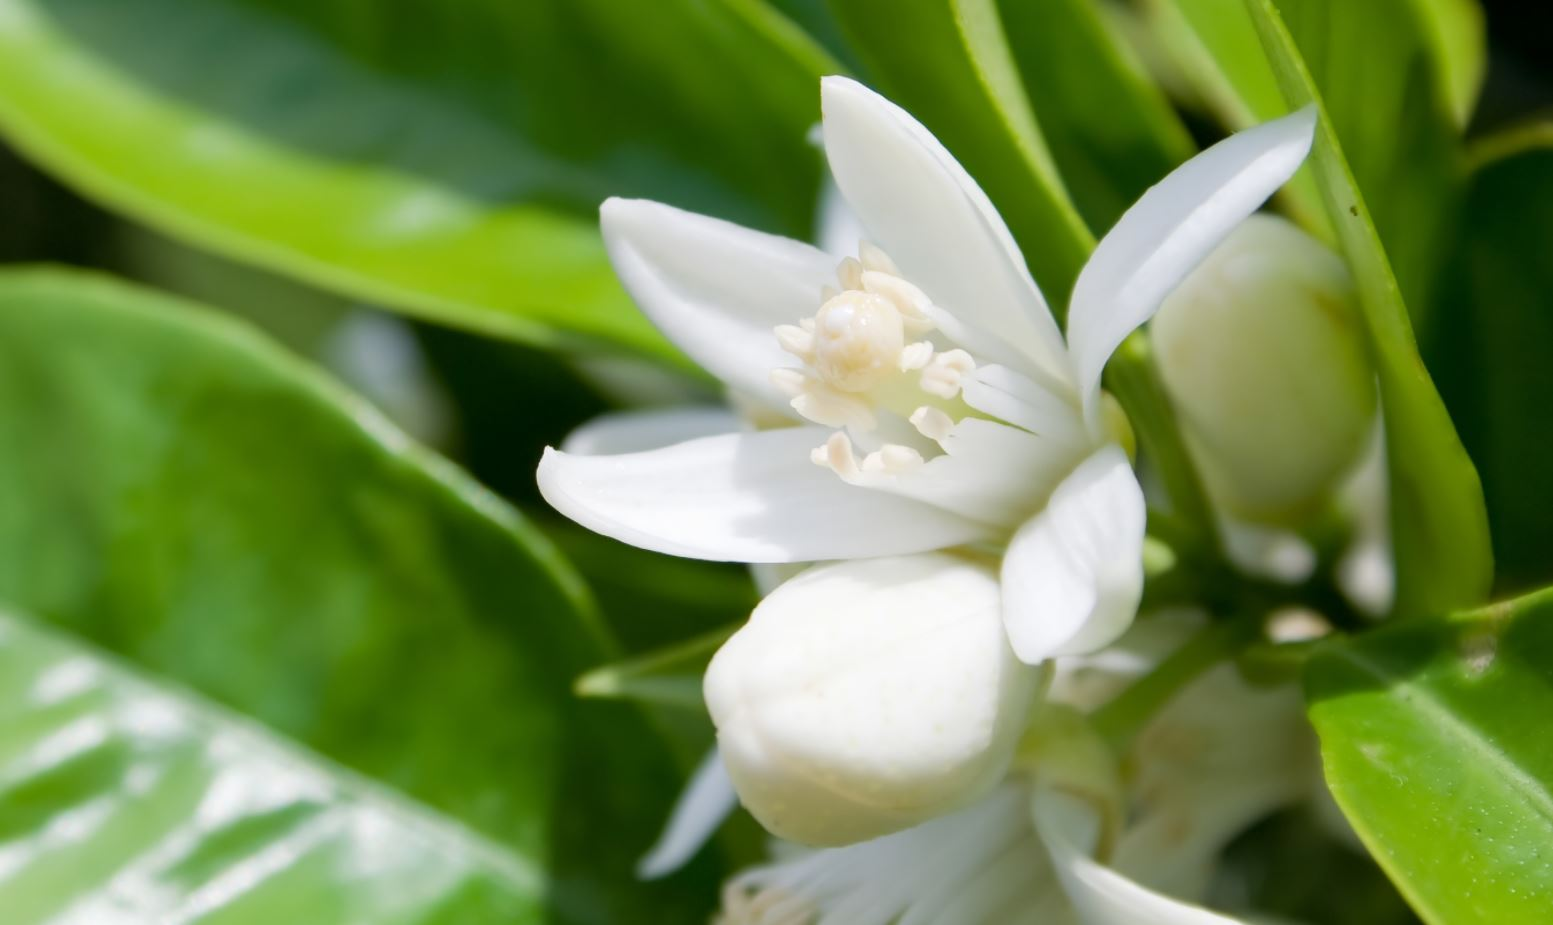 The health benefits of neroli essential oil money oil mightylinksfo